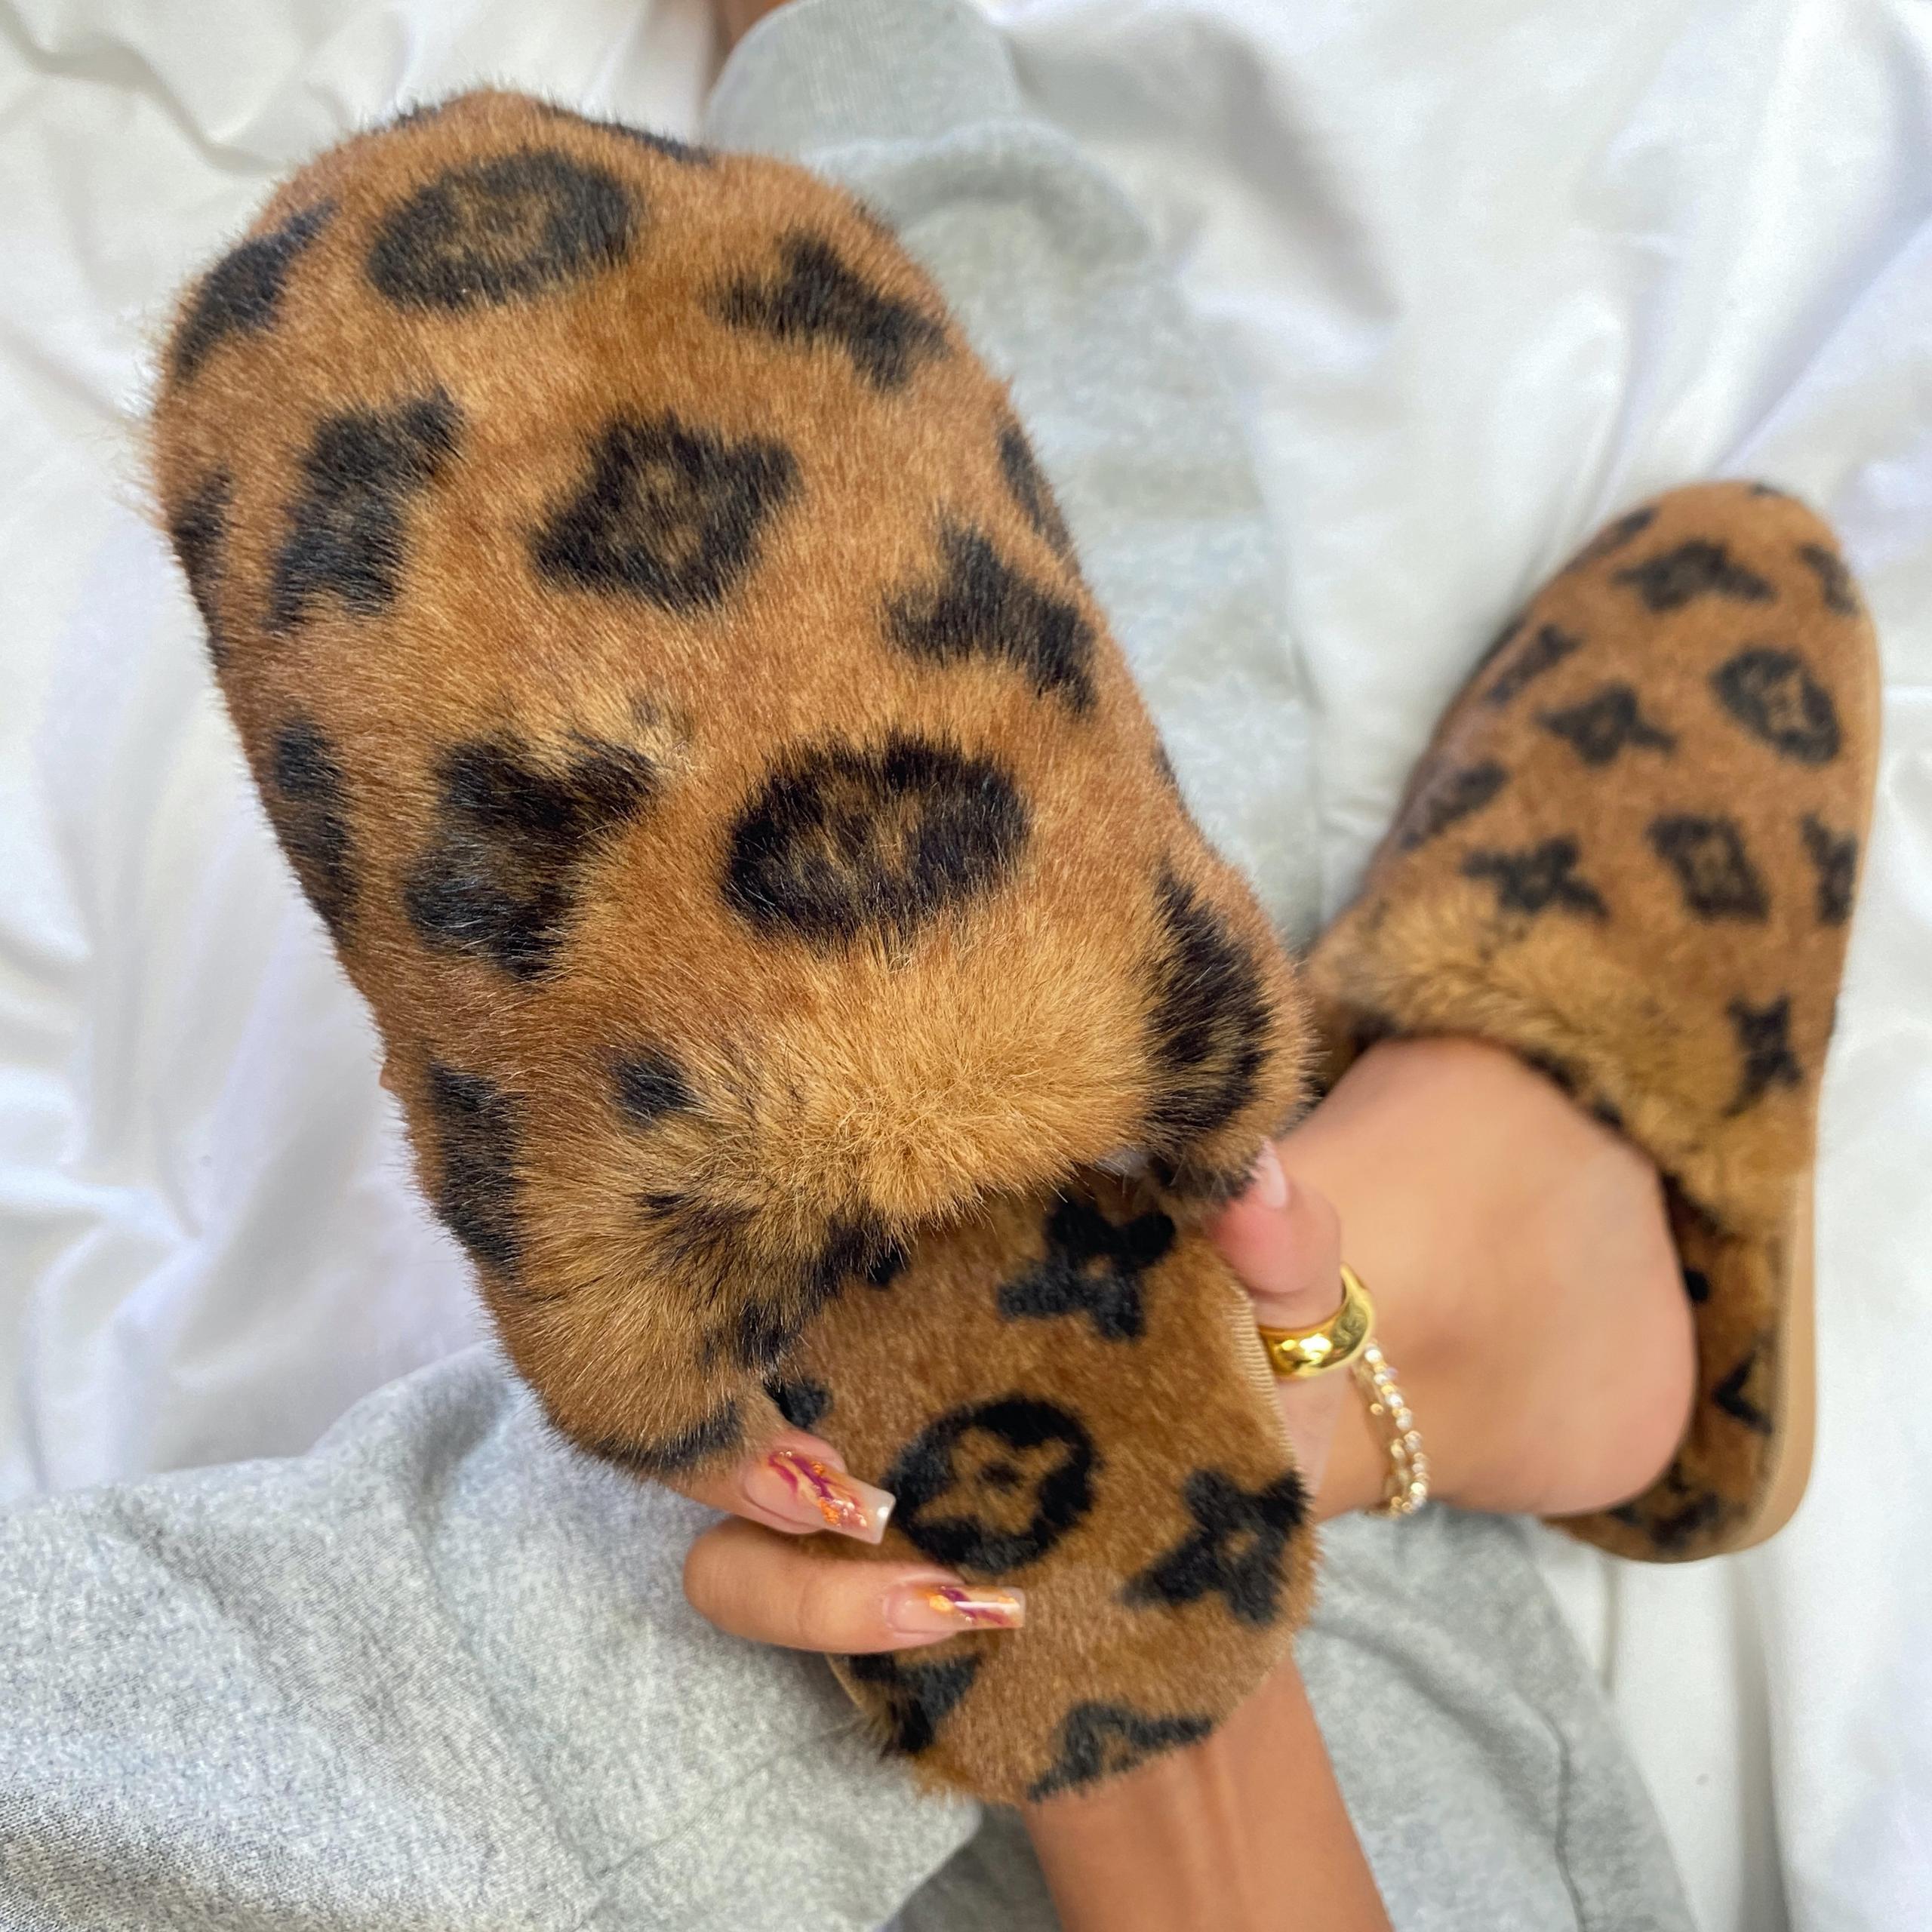 EGO Kulture Fluffy Printed Detail Flat Slipper In Tan Brown Faux Fur, Brown  - female - Size: 8